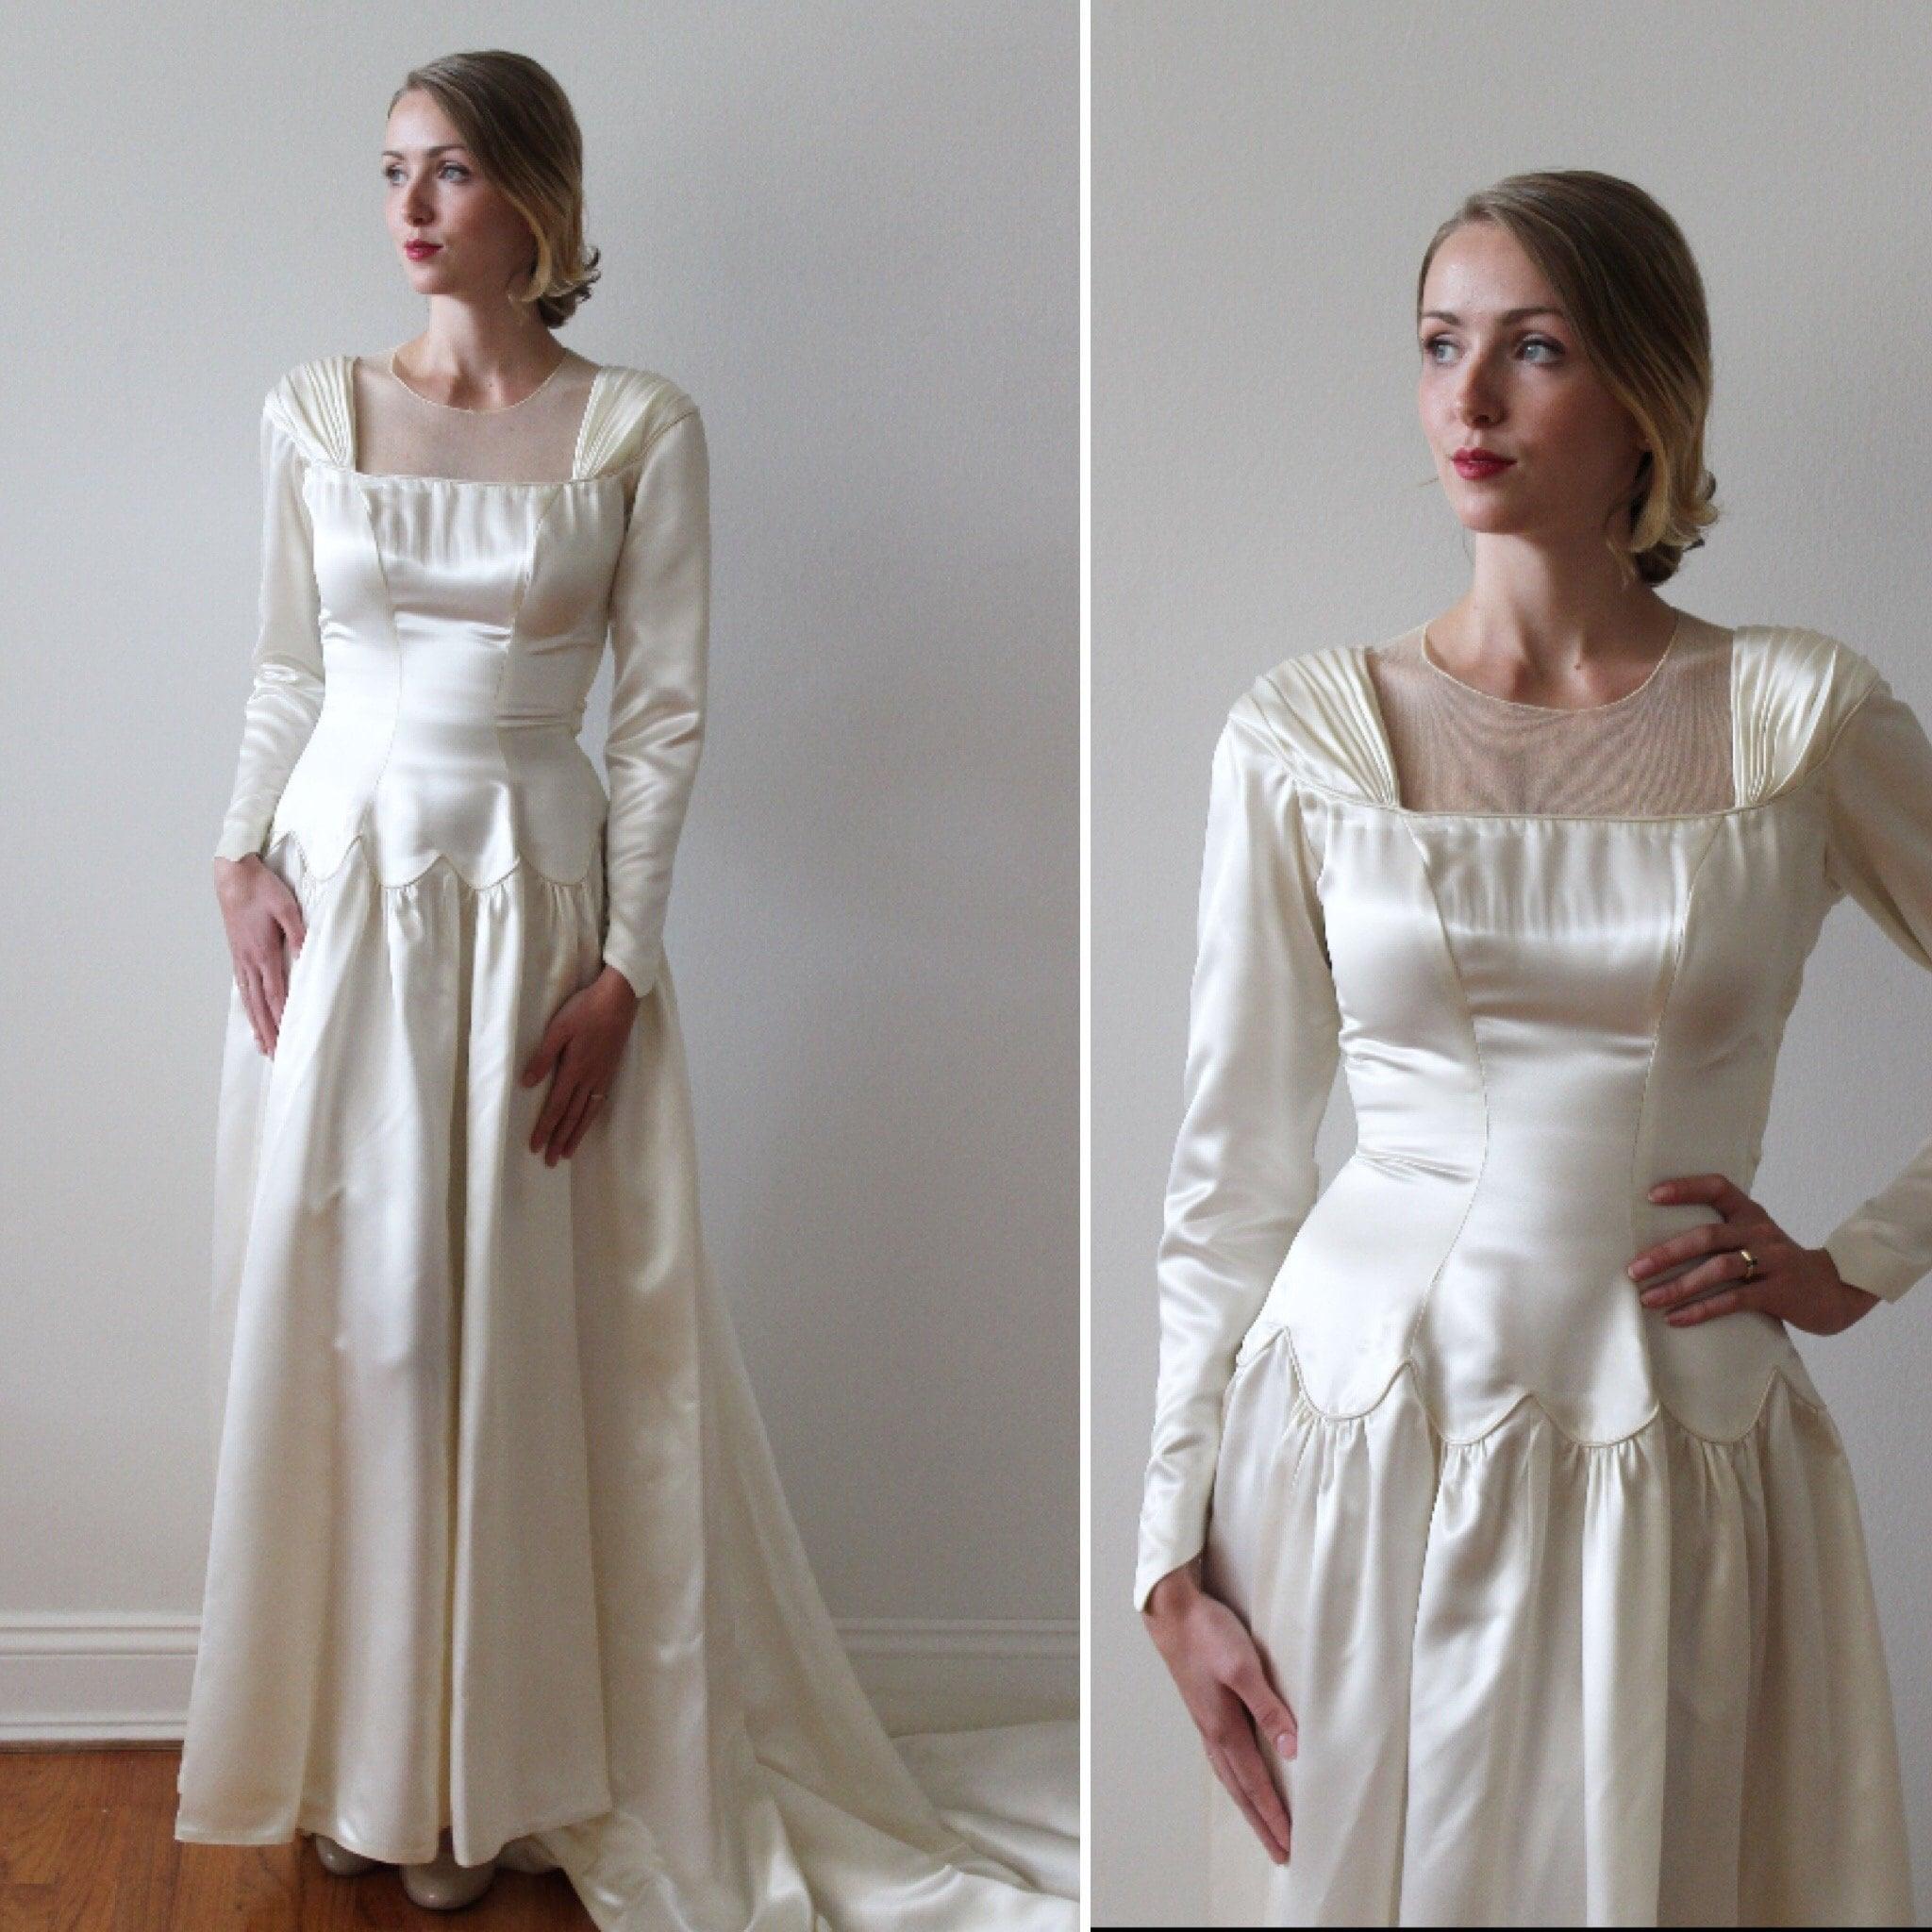 Vintage Wedding Dresses Canada: Vintage 1940s Satin Long Sleeved Wedding Dress With